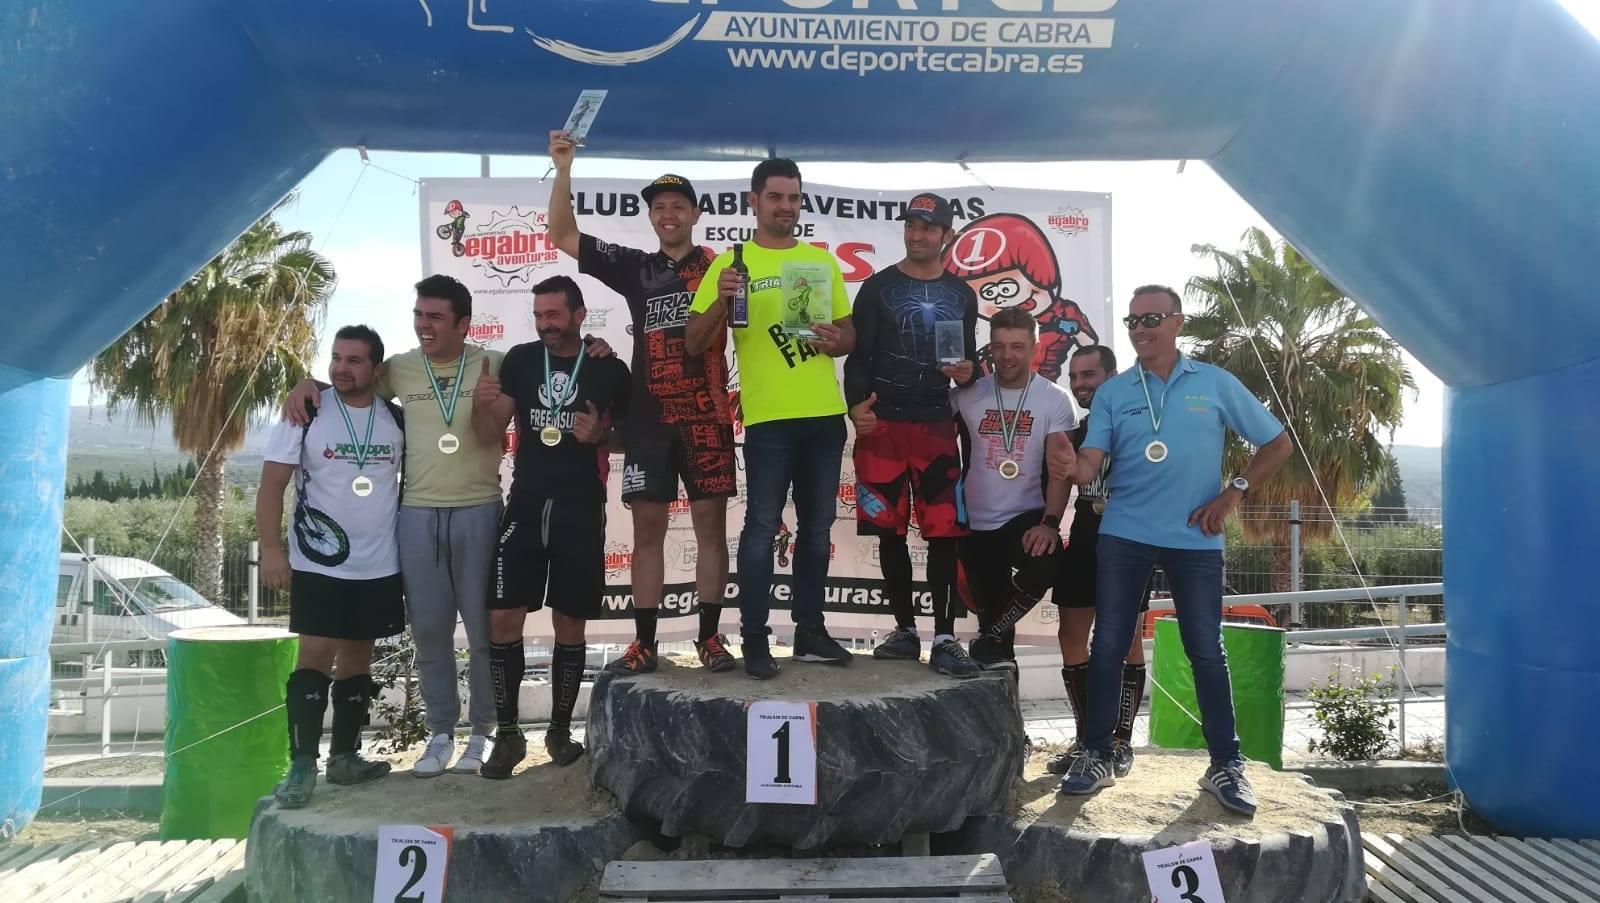 7ª PRUEBA CAMPEONATO ANDALUCIA TRIALBICI - VII TRIALSIN DE CABRA